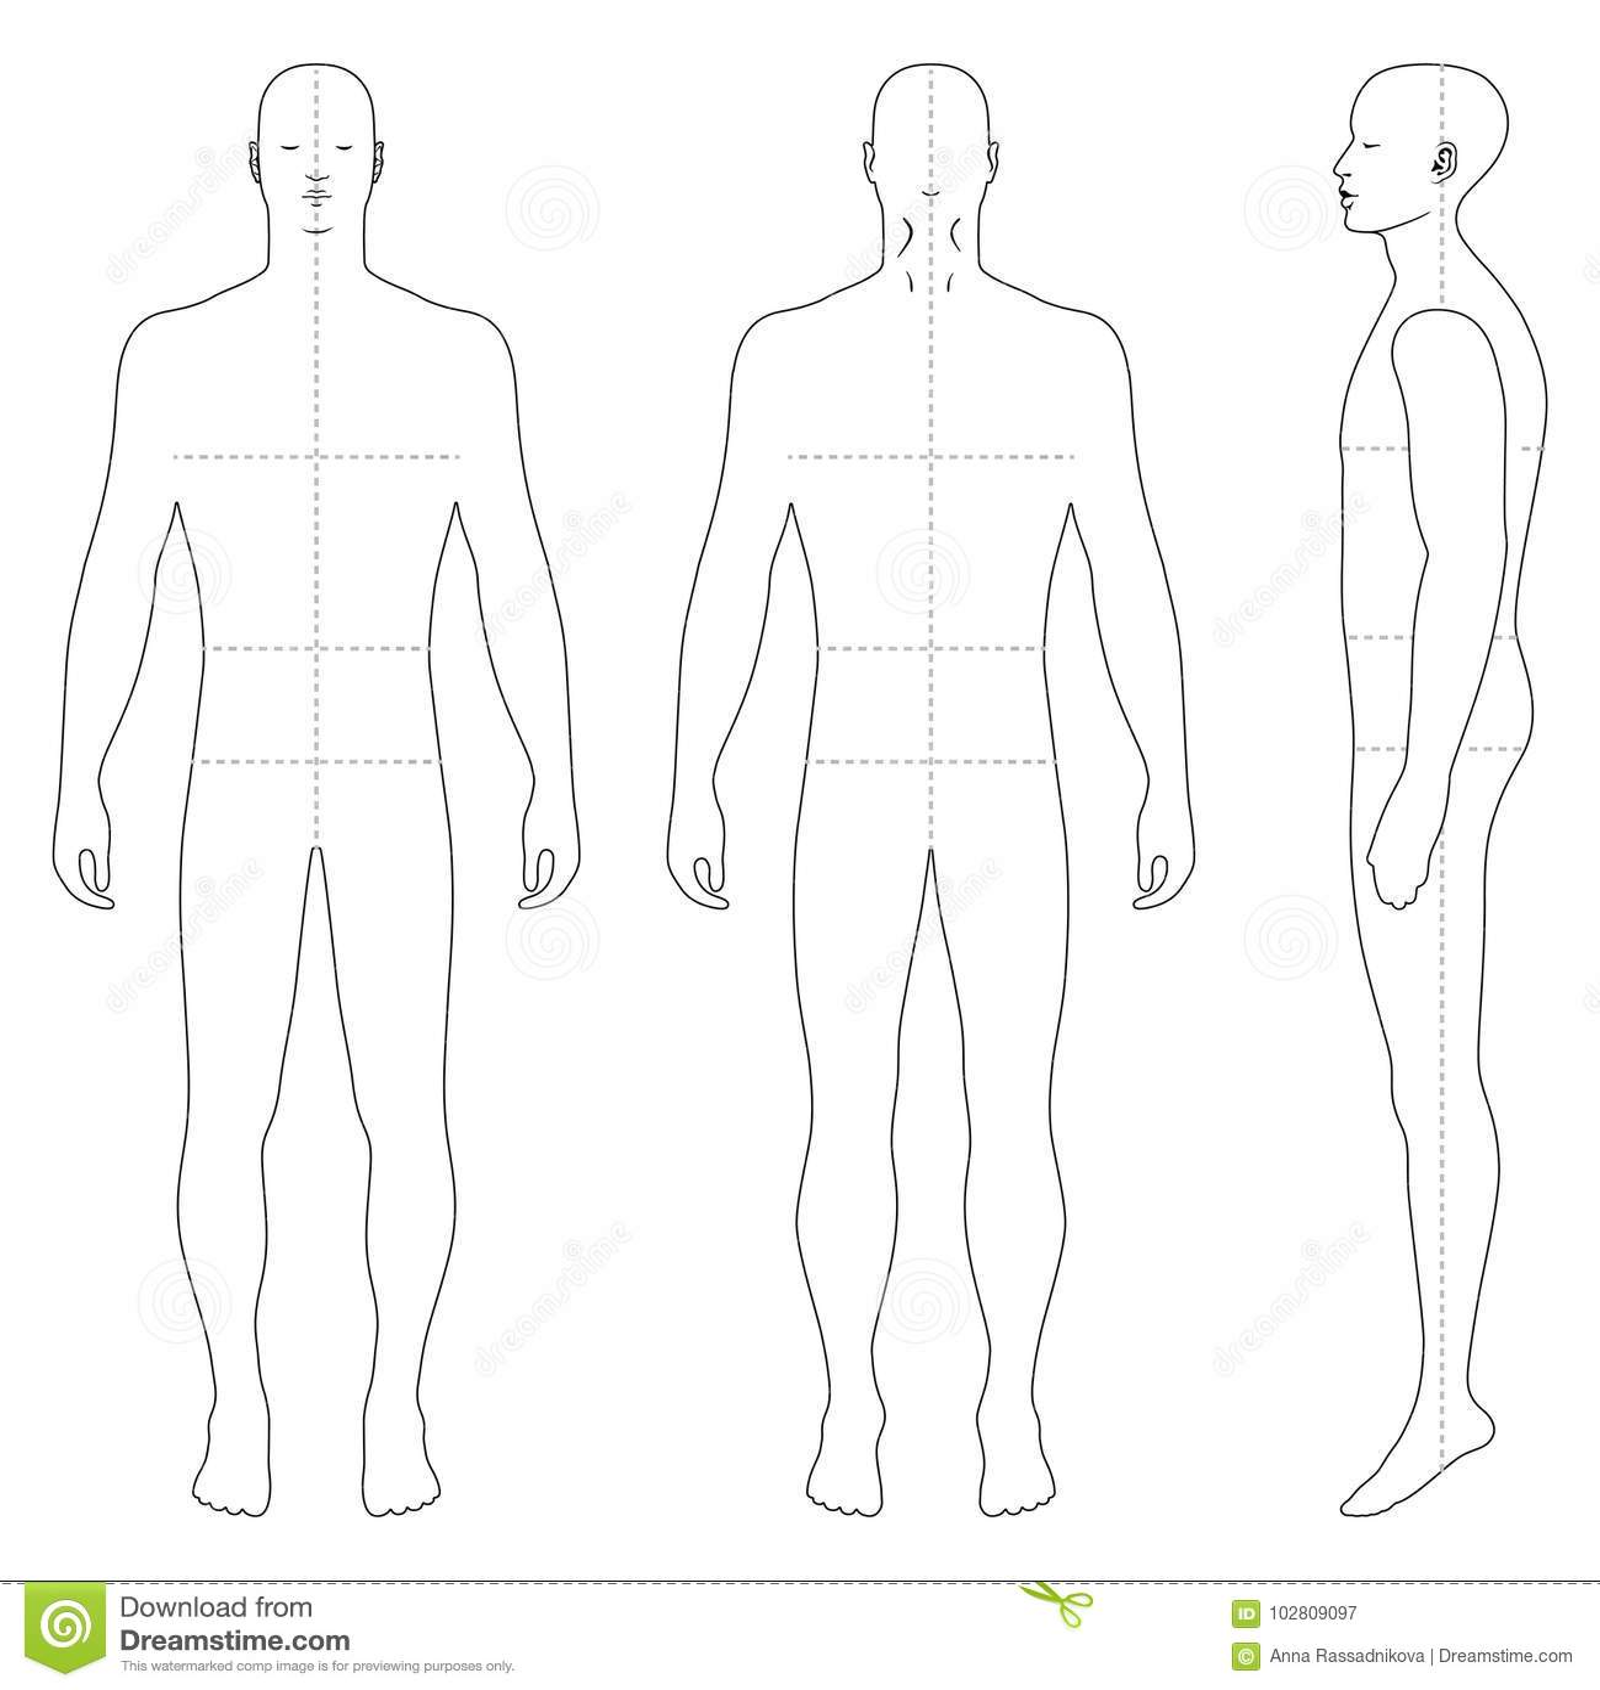 Fashion man figure stock vector. Illustration of figure